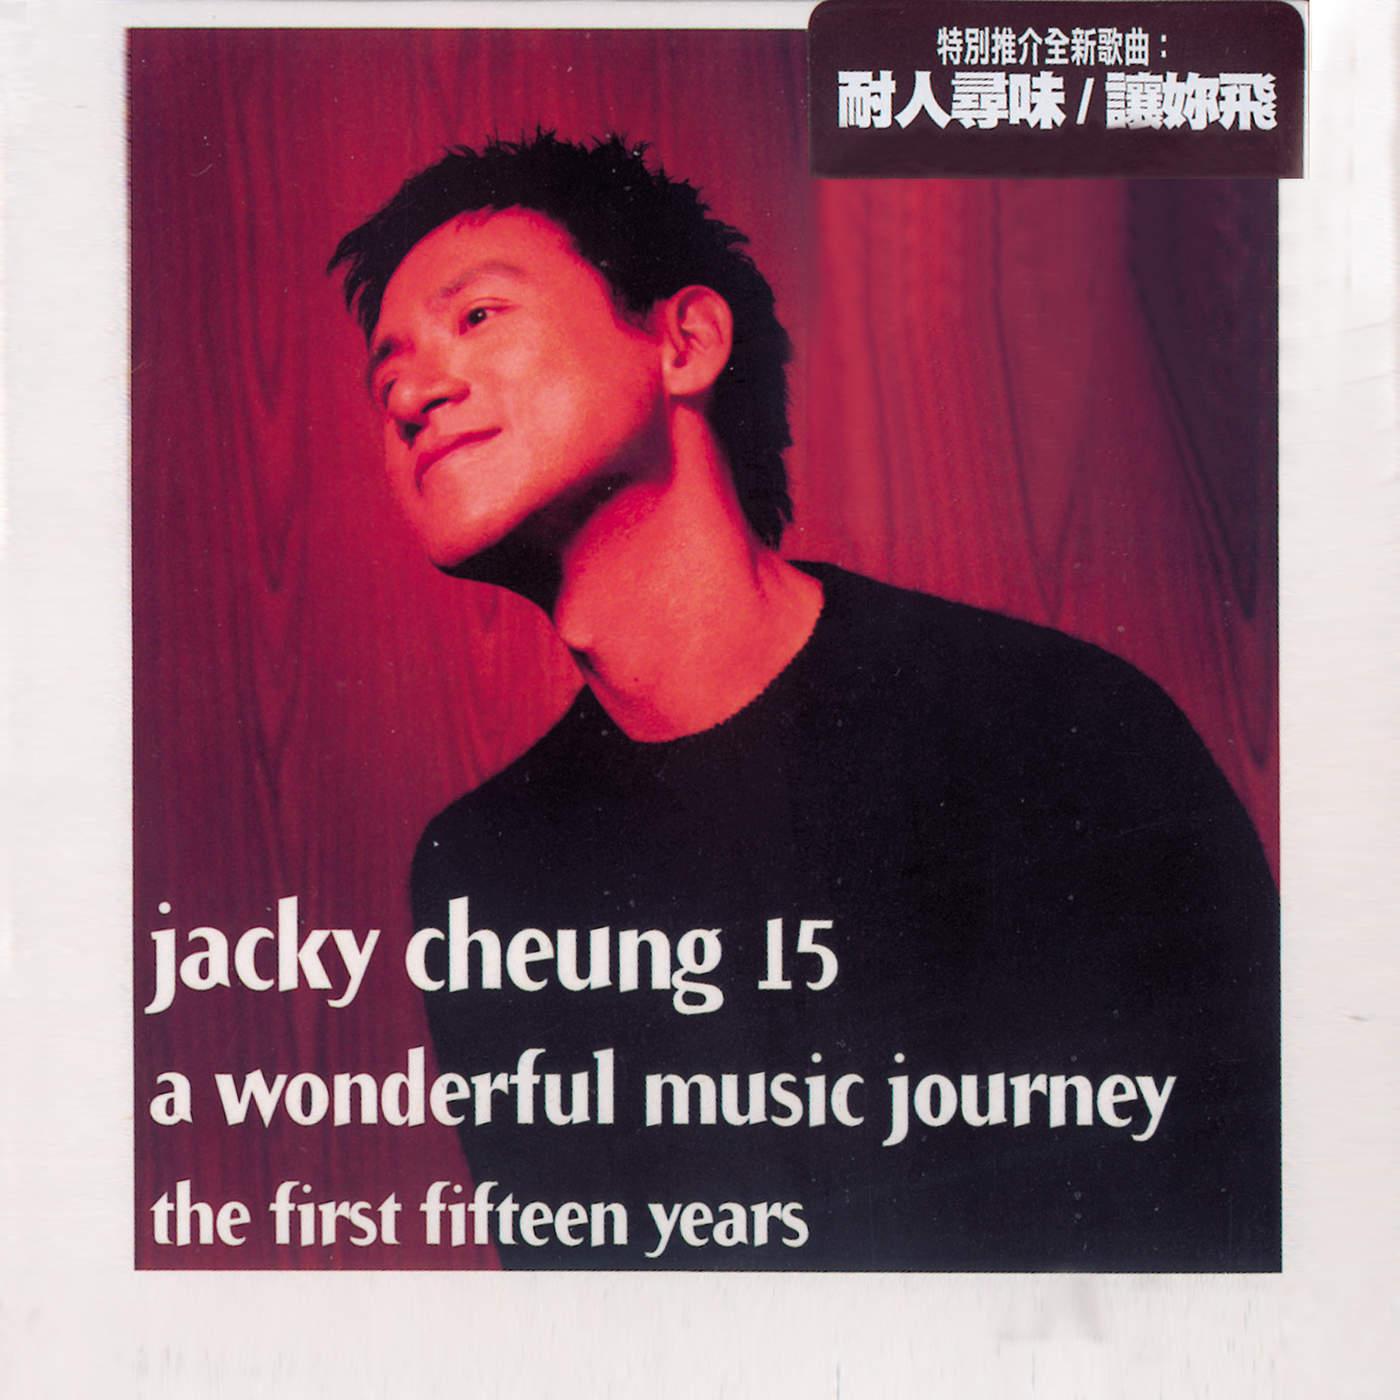 张学友 - Jacky Cheung 15